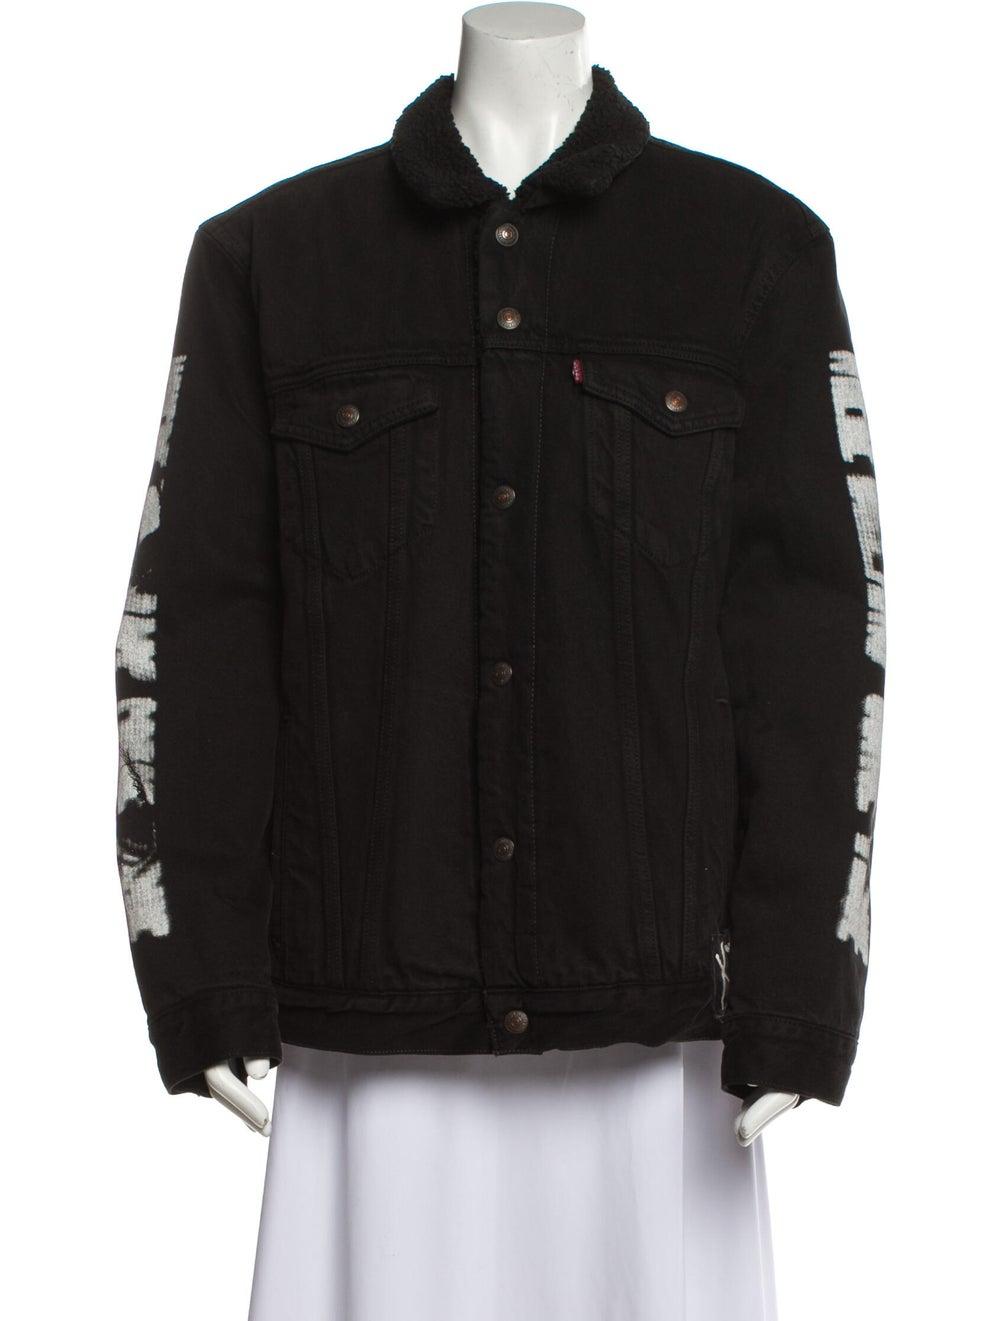 Levi's Vintage Clothing Denim Jacket Denim - image 1